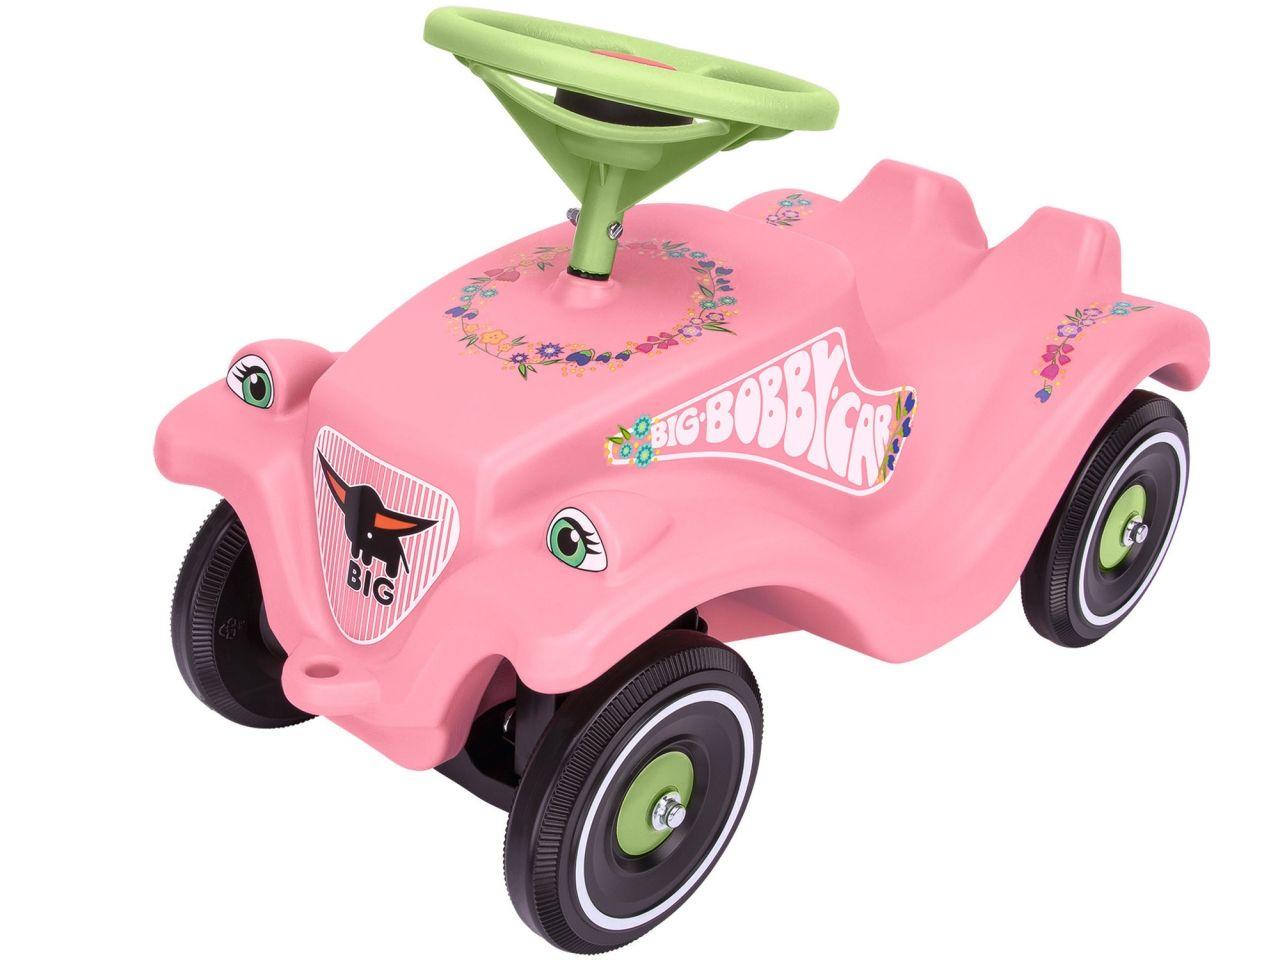 Каталка-толокар Bobby Car Classic - Розовые цветы